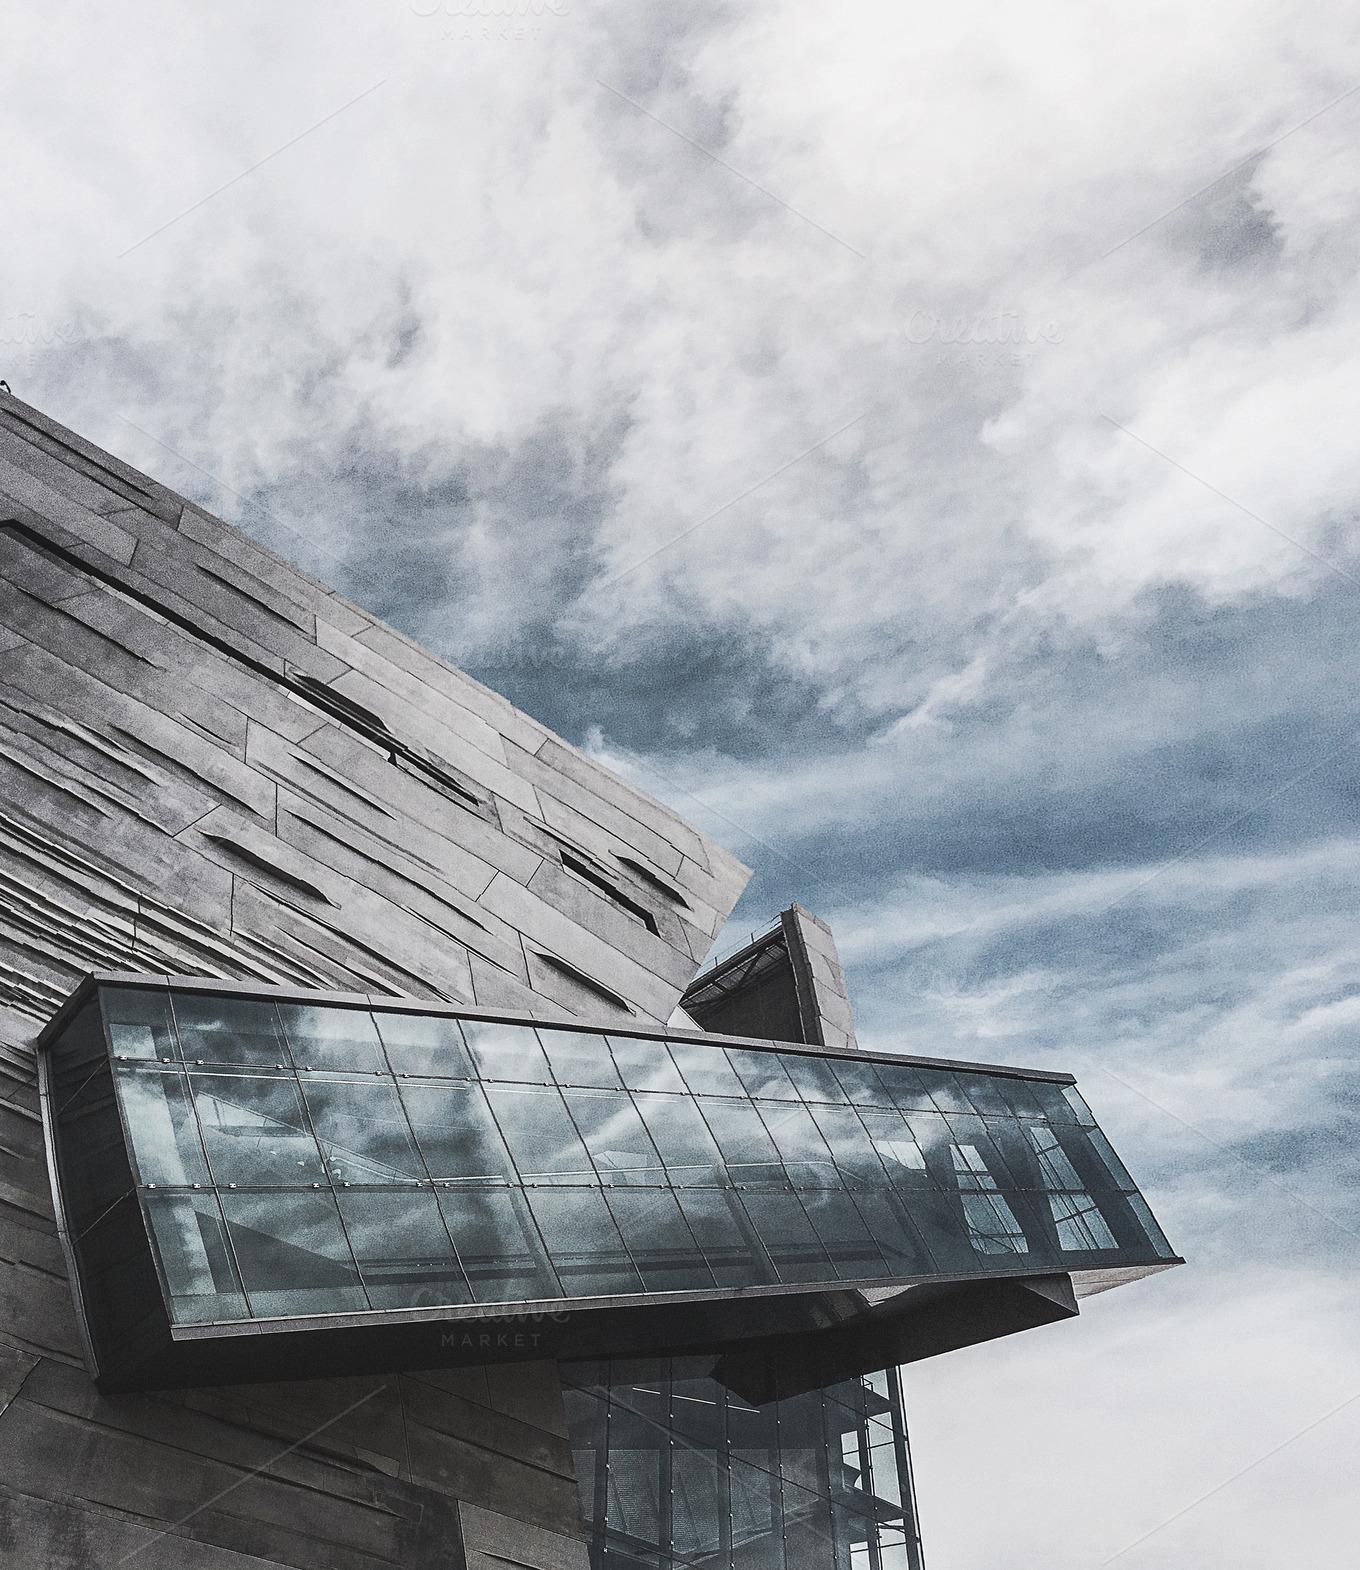 Perot Museum in Dallas, TX